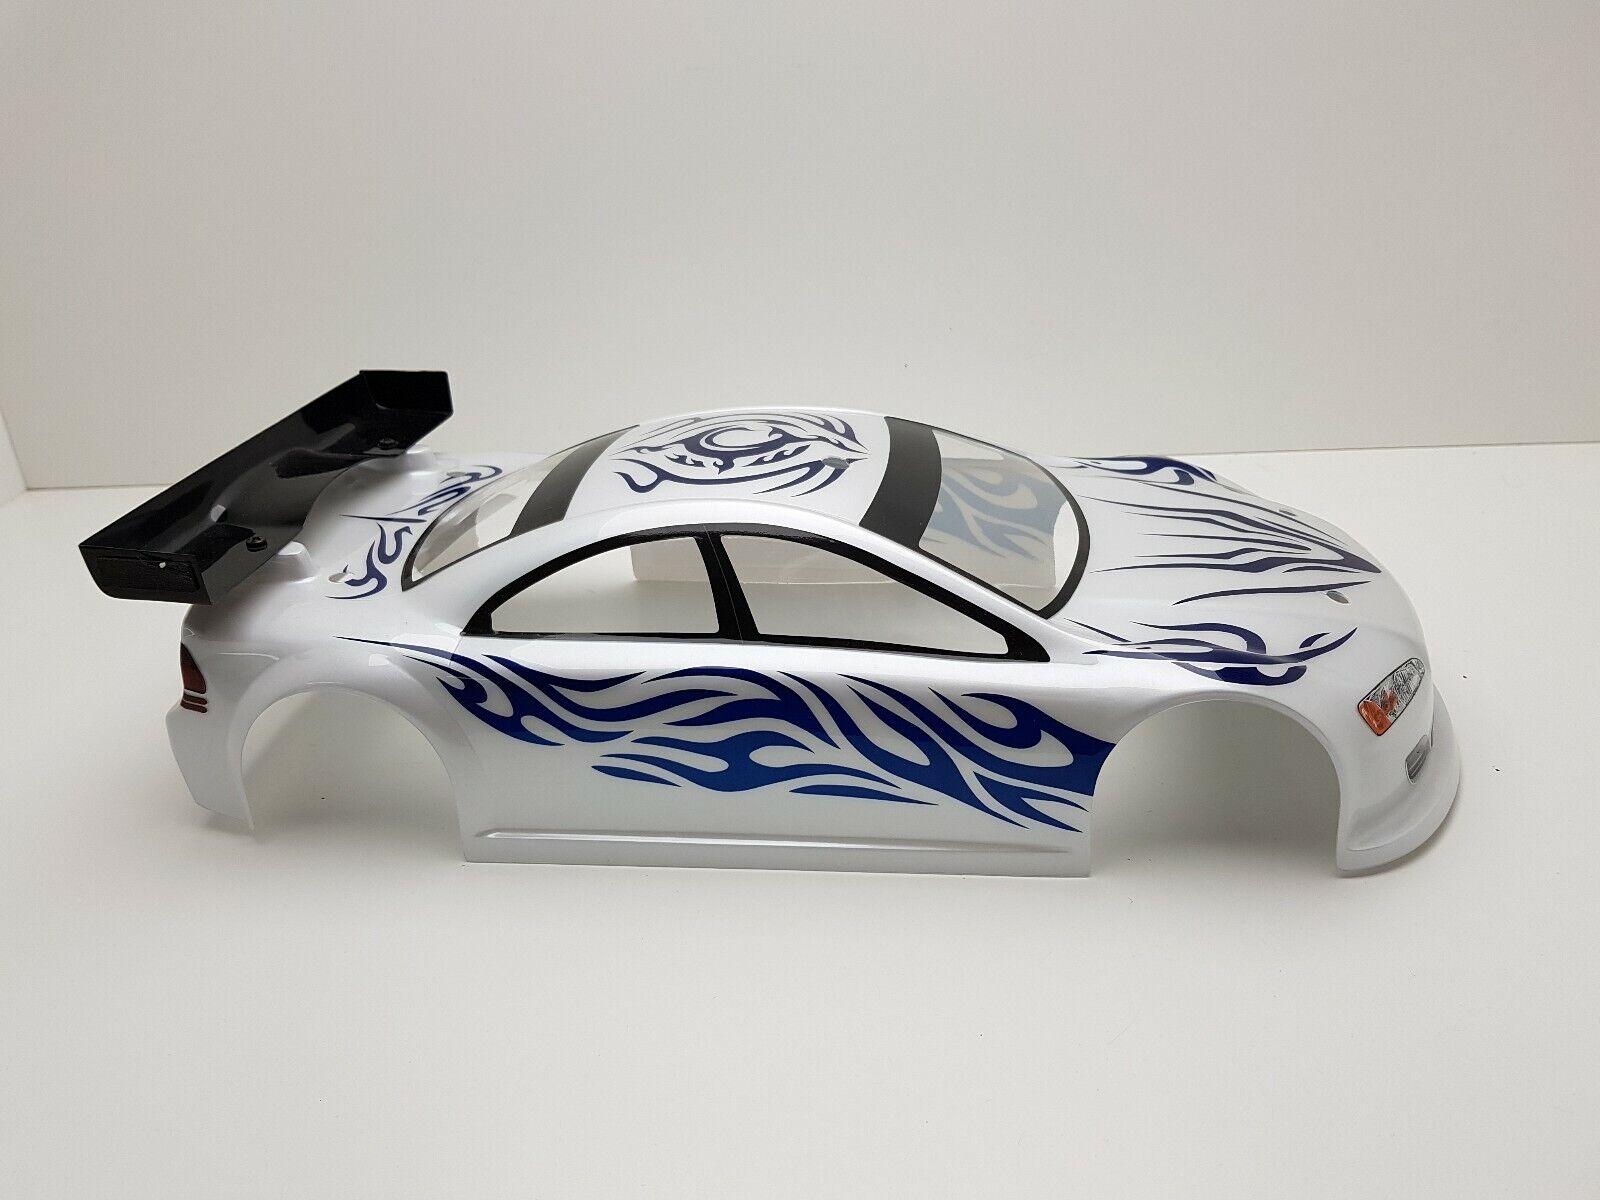 Kyosho Dodge Stratus 190mm 1 10th Body Shell Cover OZRC